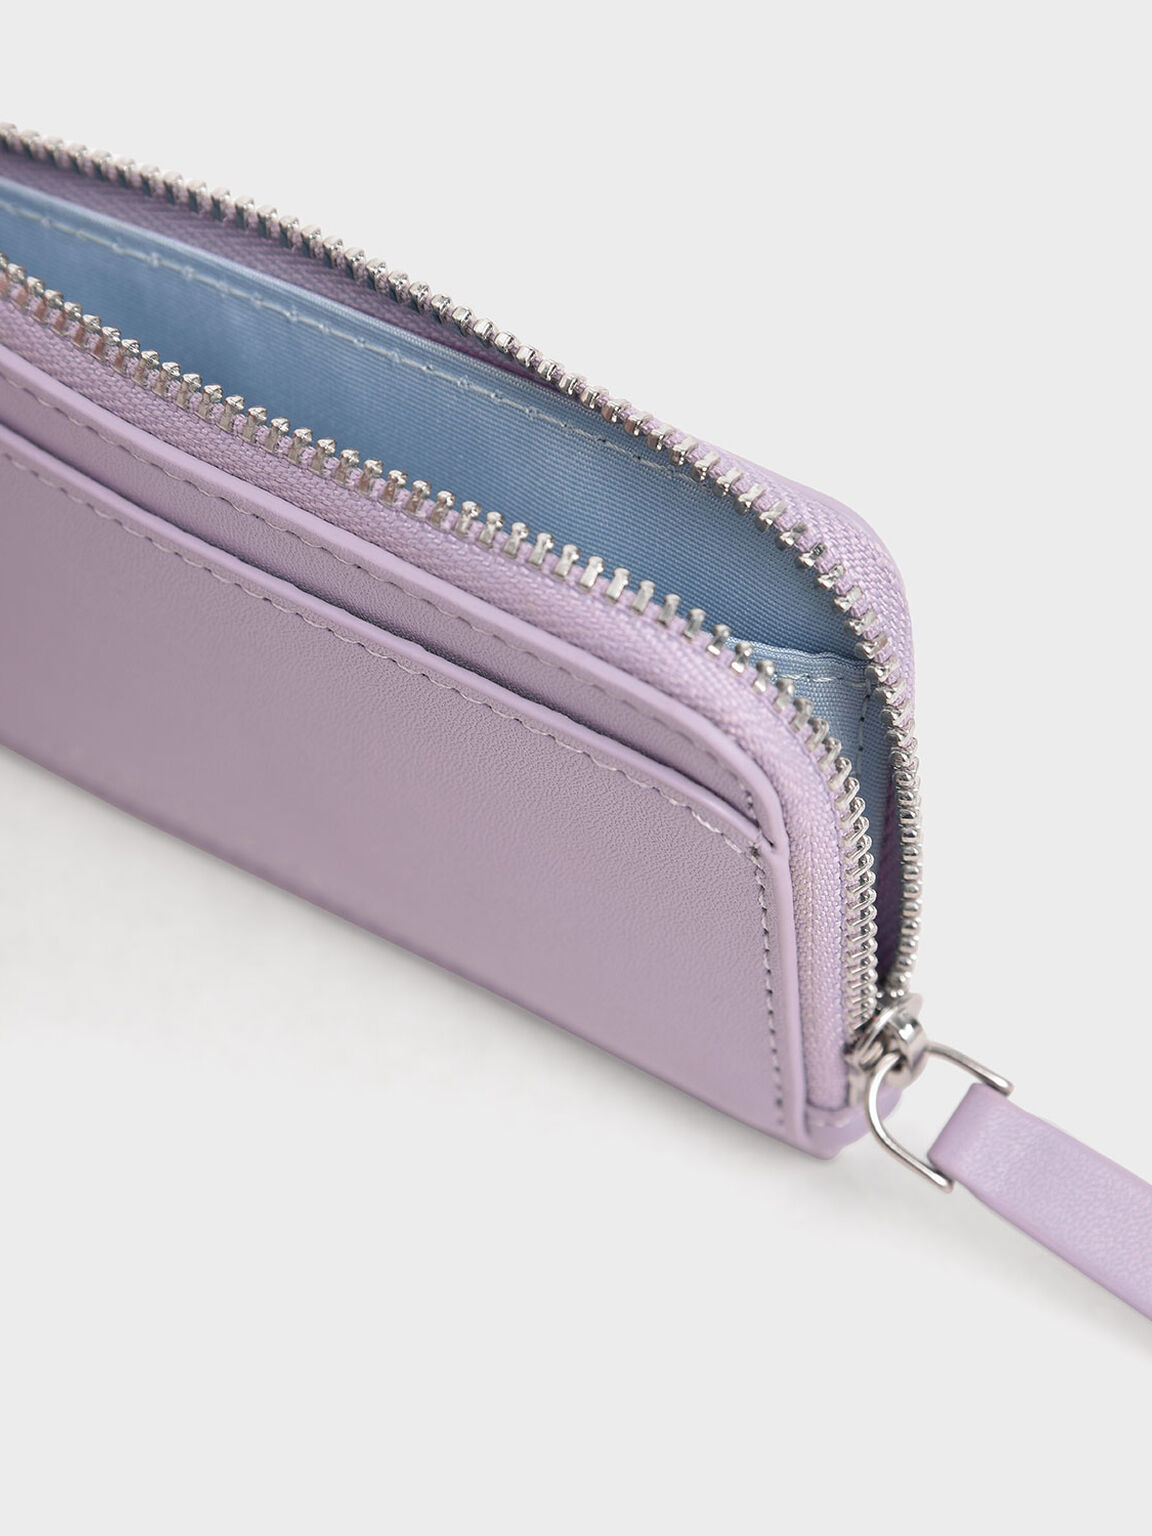 Zip Around Multi-Slot Card Holder, Lilac, hi-res